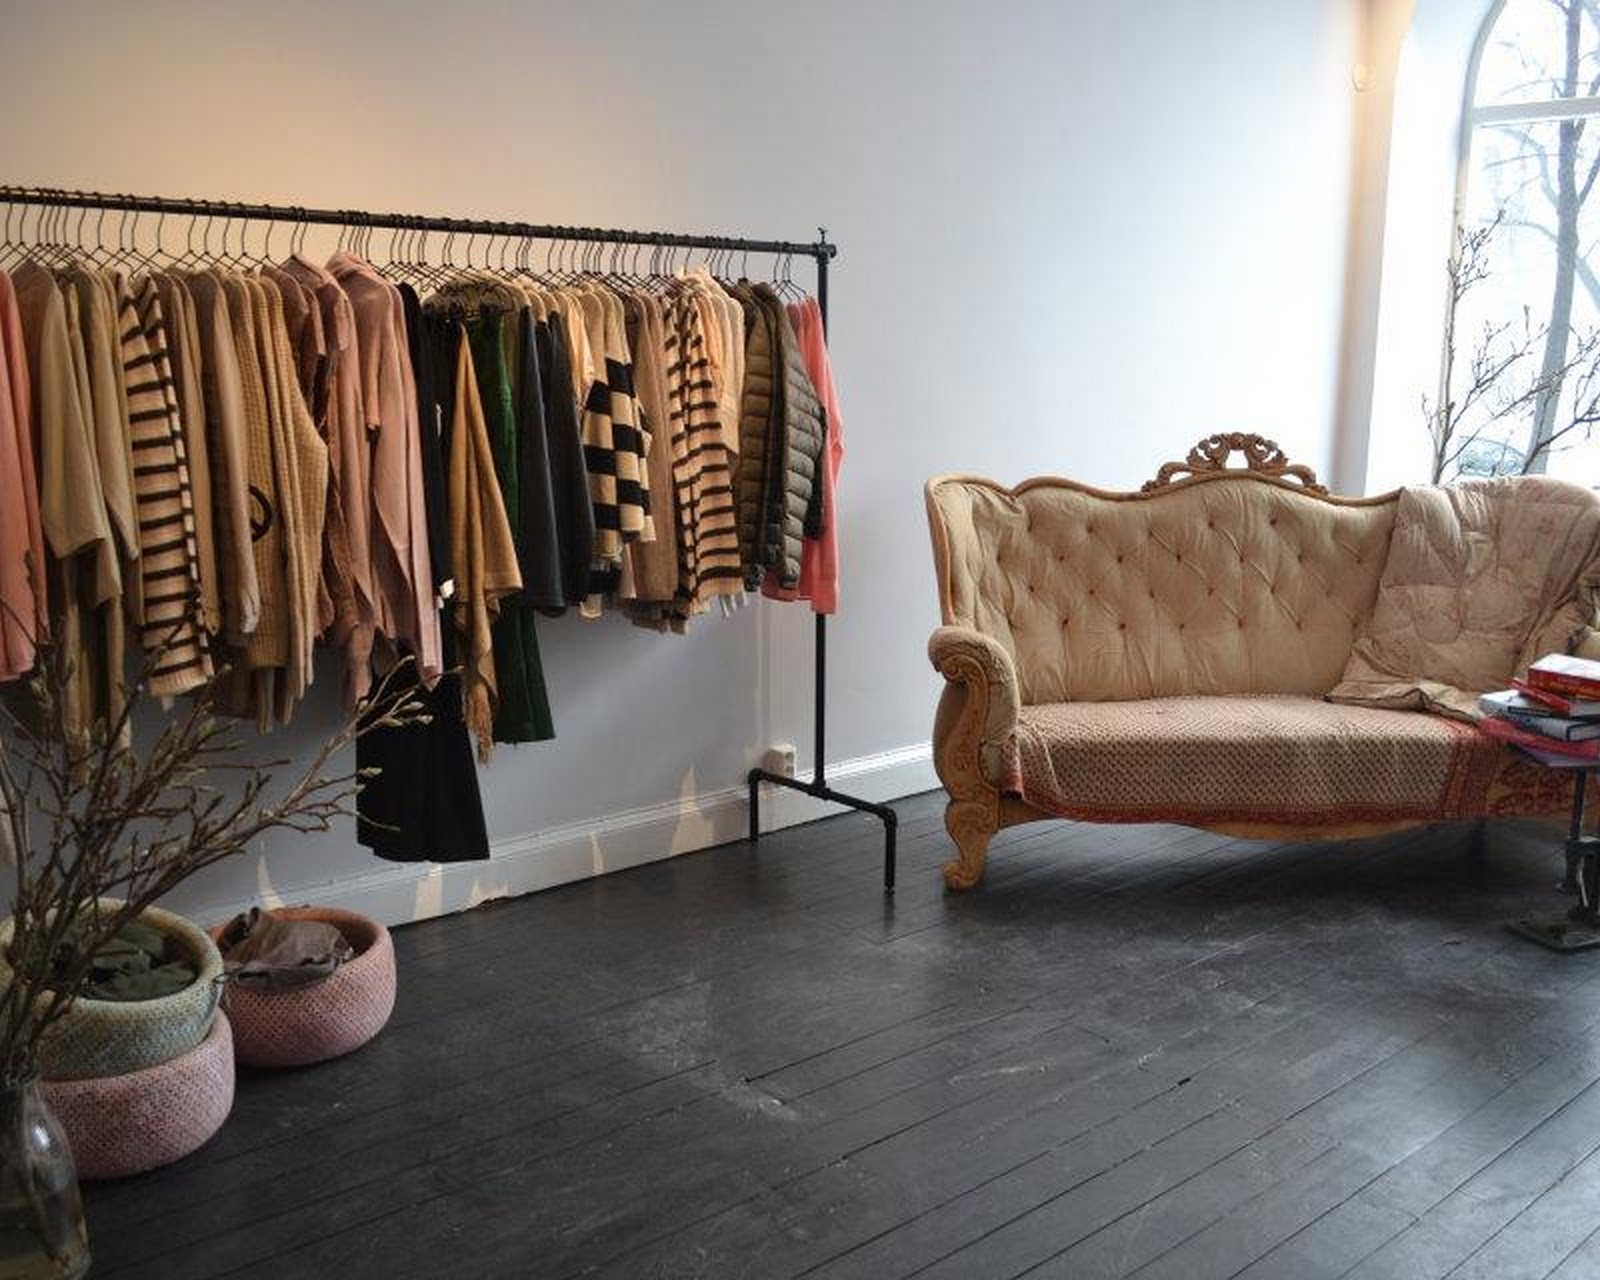 http://houseofbliss.blogspot.com/search/label/Organise